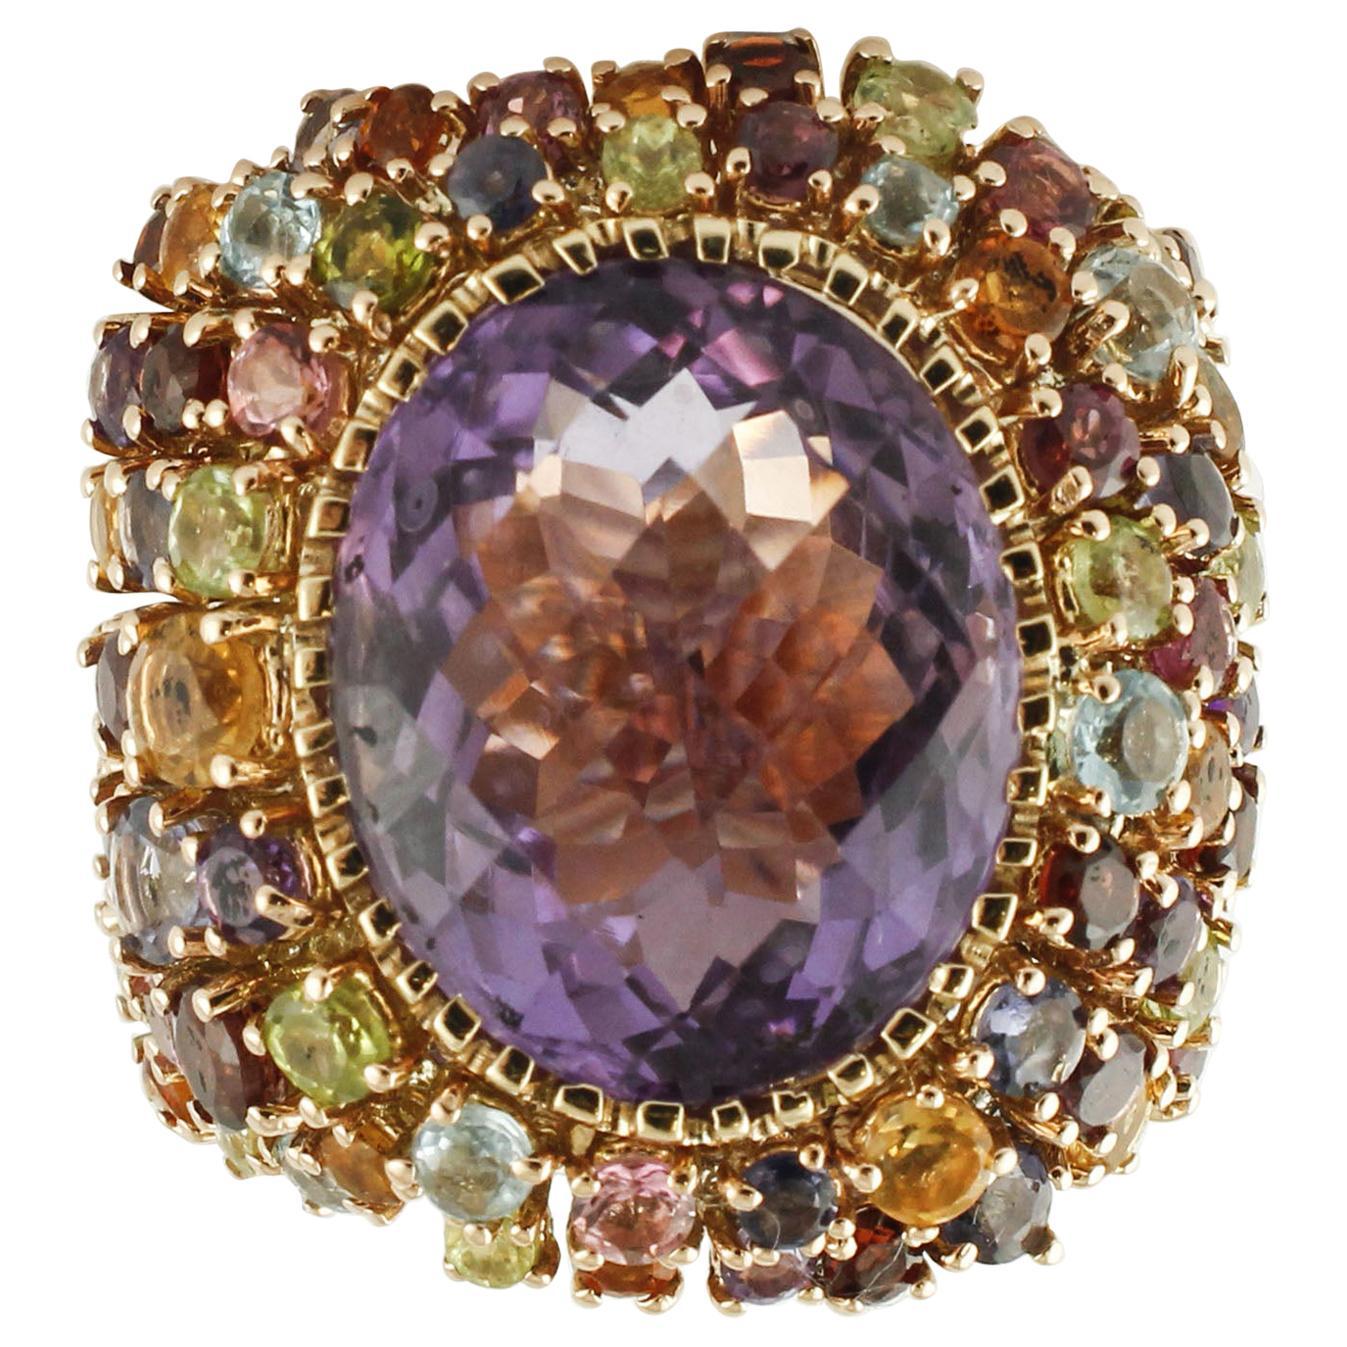 Amethyst, Peridots, Topazes, Tourmaline, Aquamarine, Garnets Yellow Gold Ring